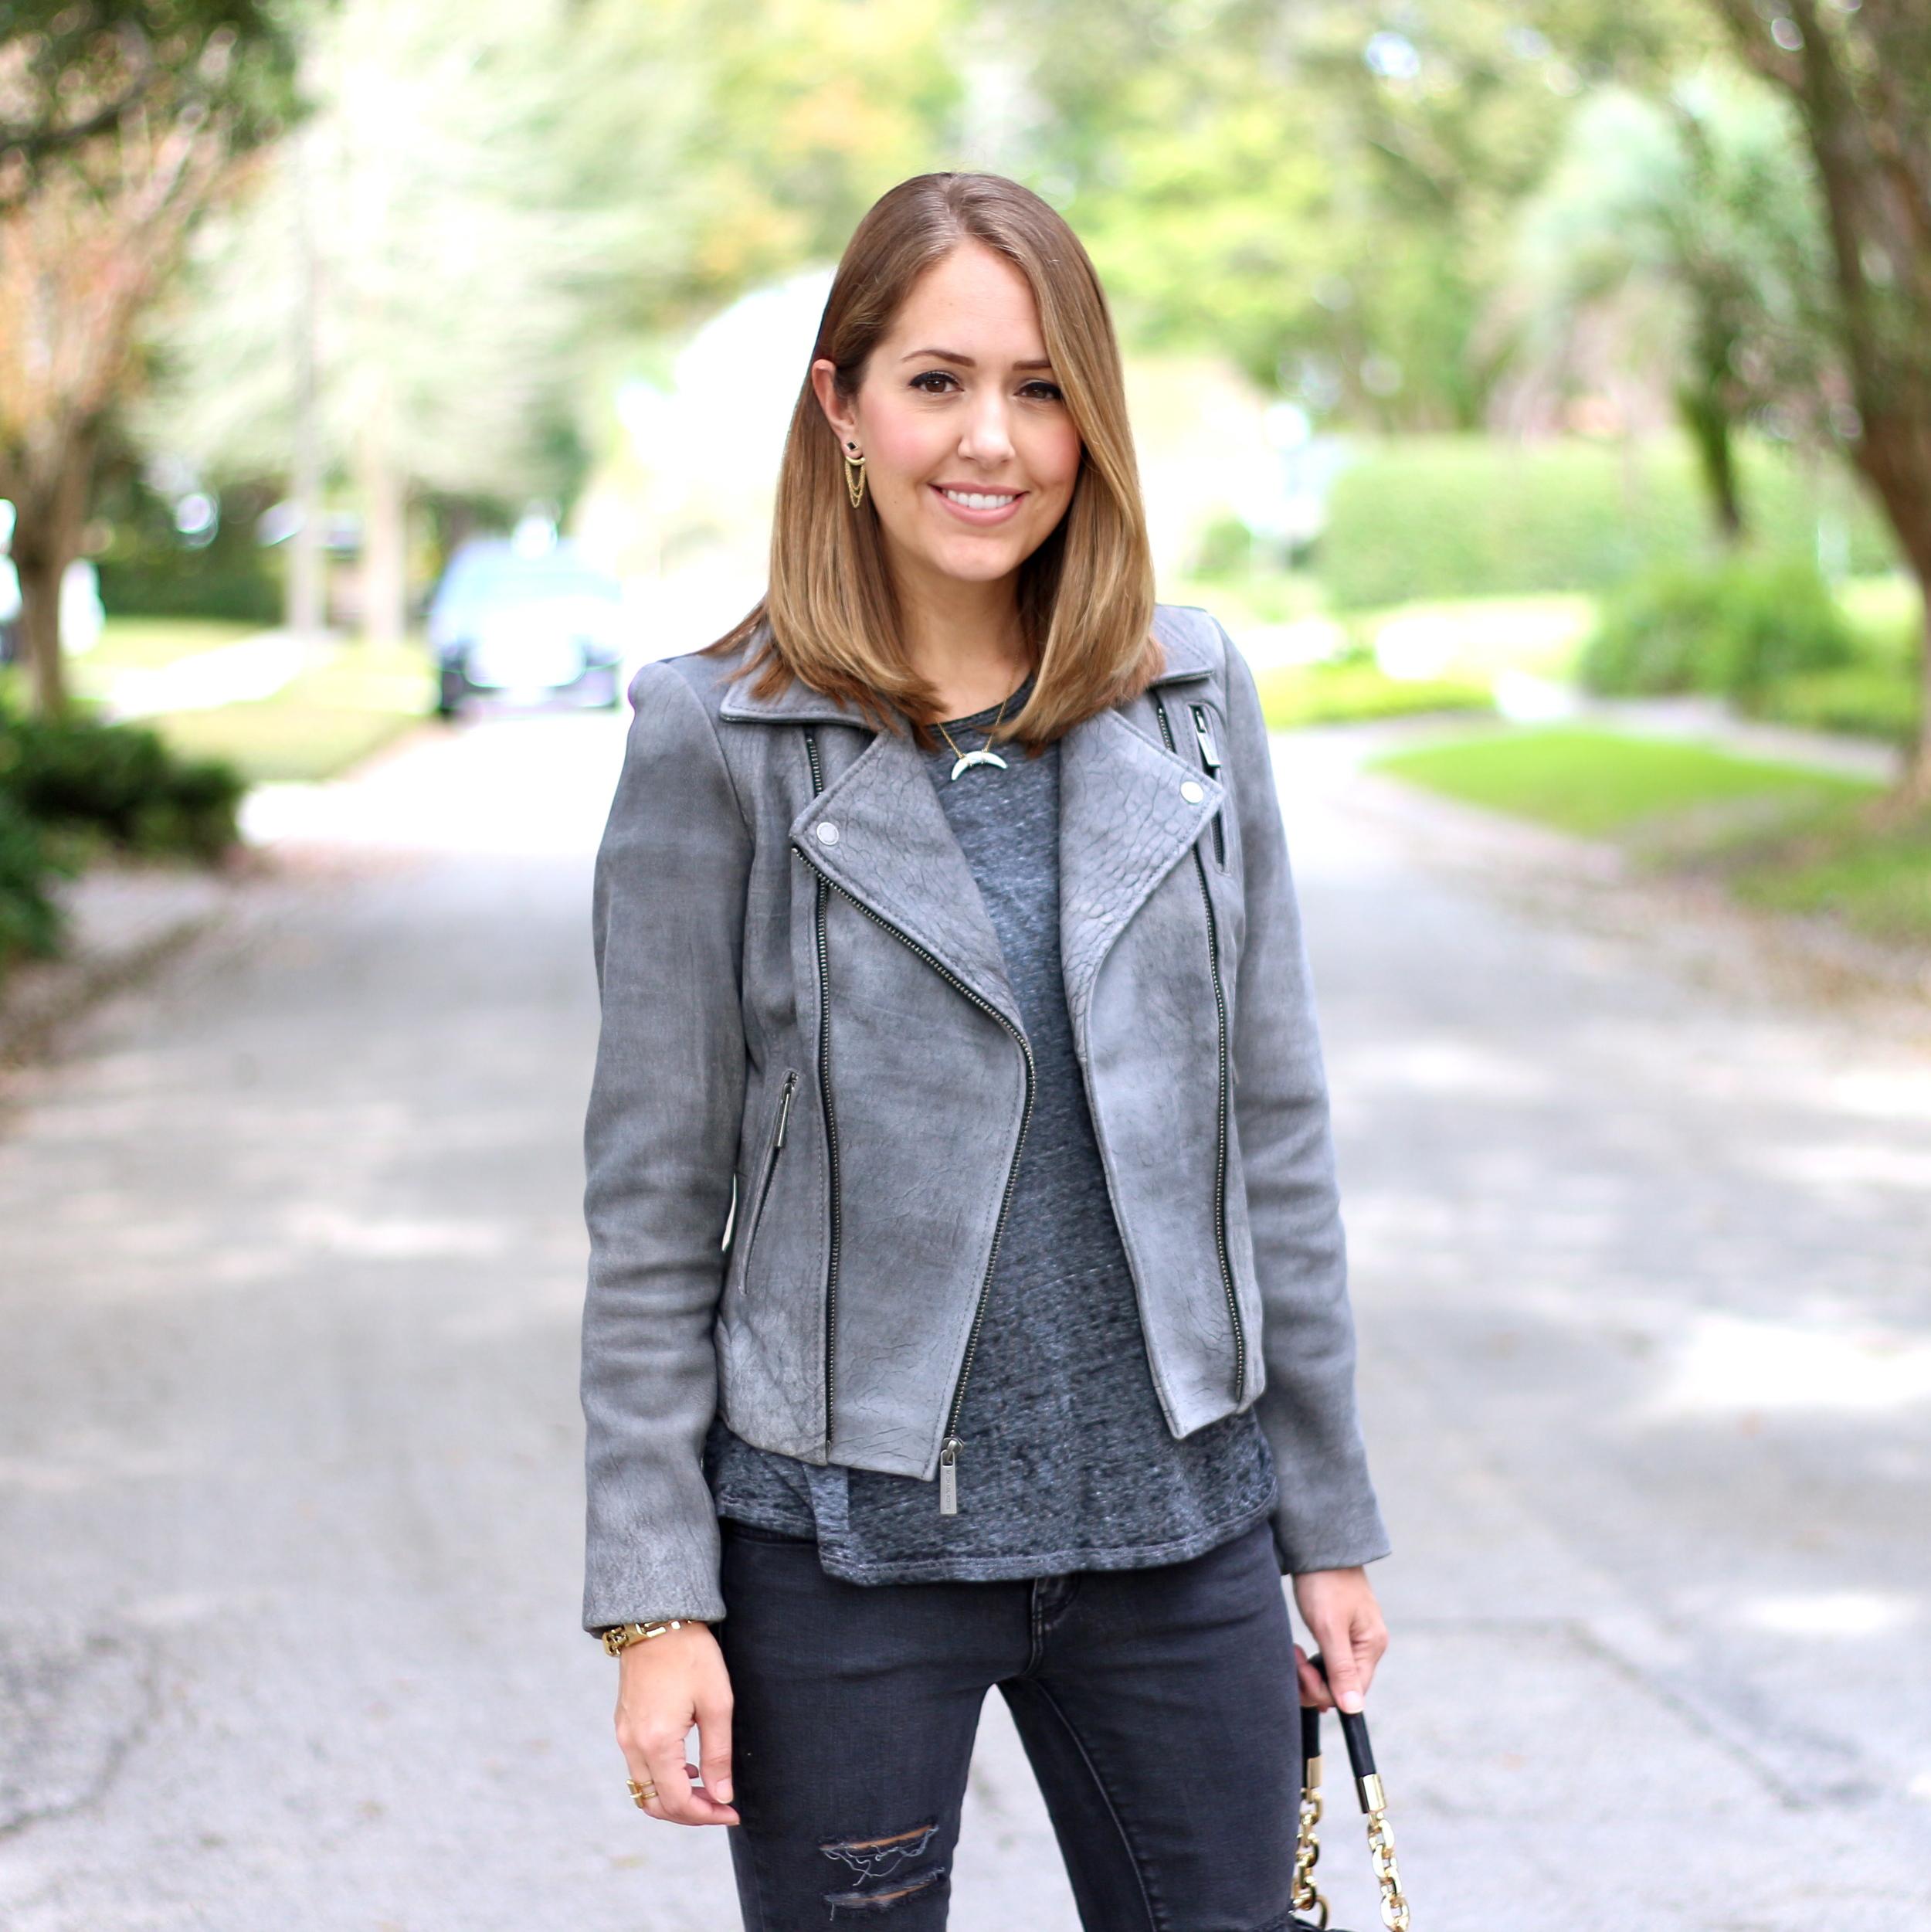 Gray leather jacket, black jeans